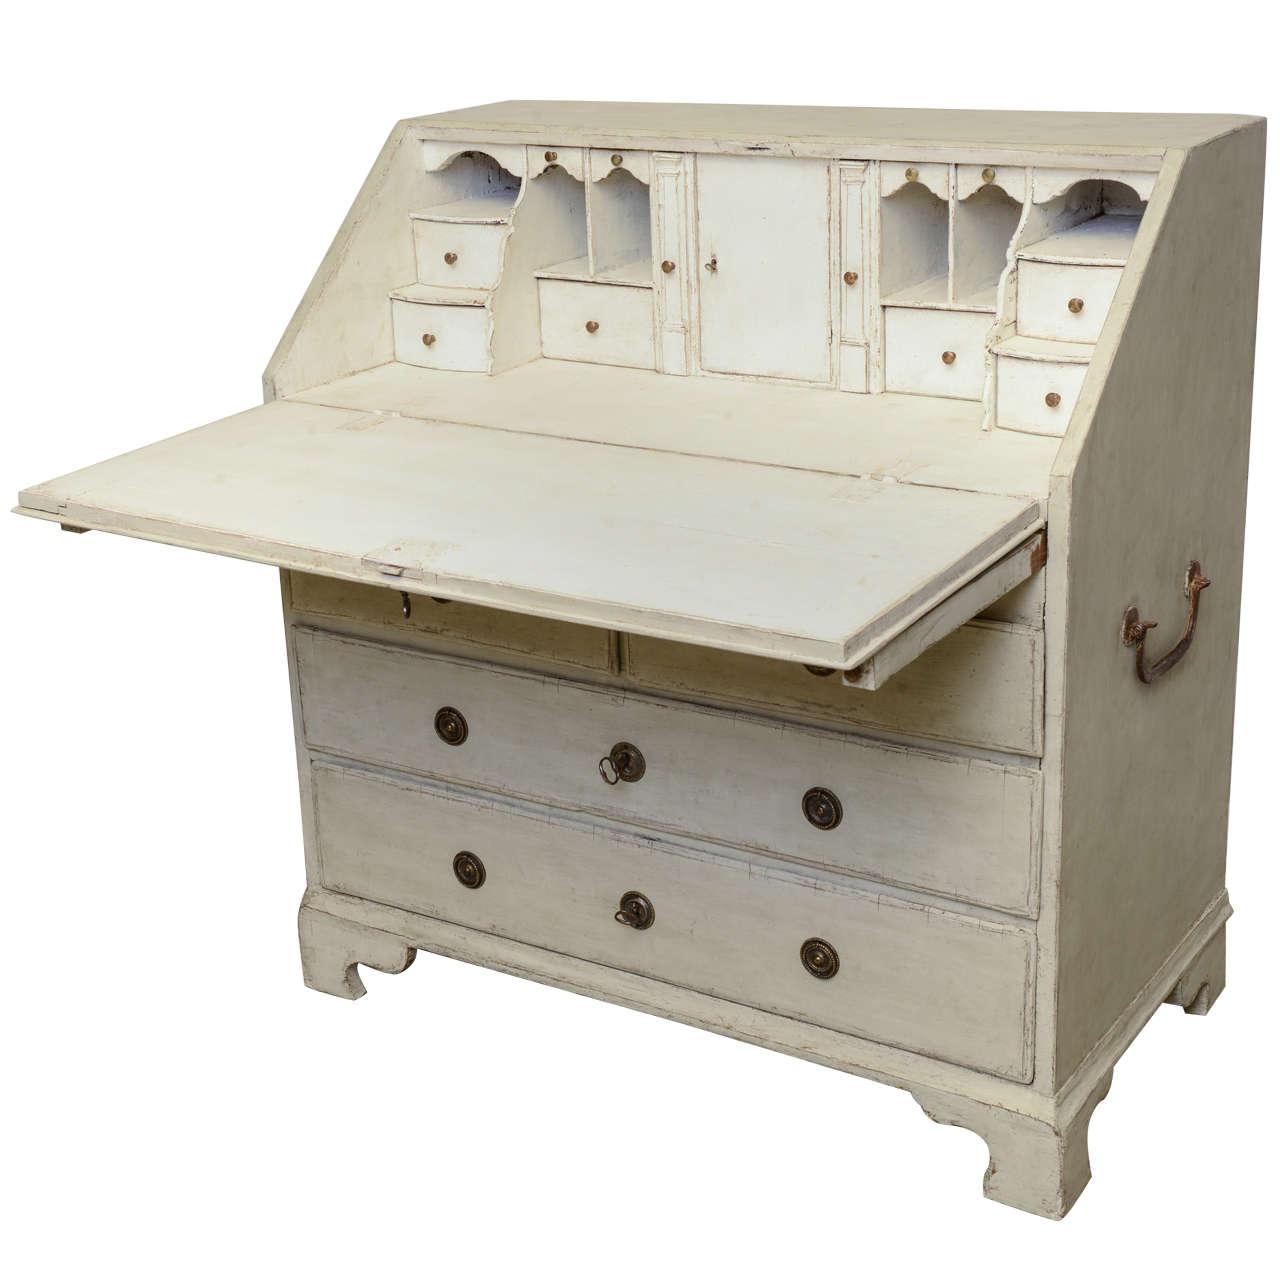 slanted writing desk Long mid century modern desk w/ slanted legs - loveseat is the best way to buy vintage home furniture in san diego hans j wegner danish modern writing desk 1.